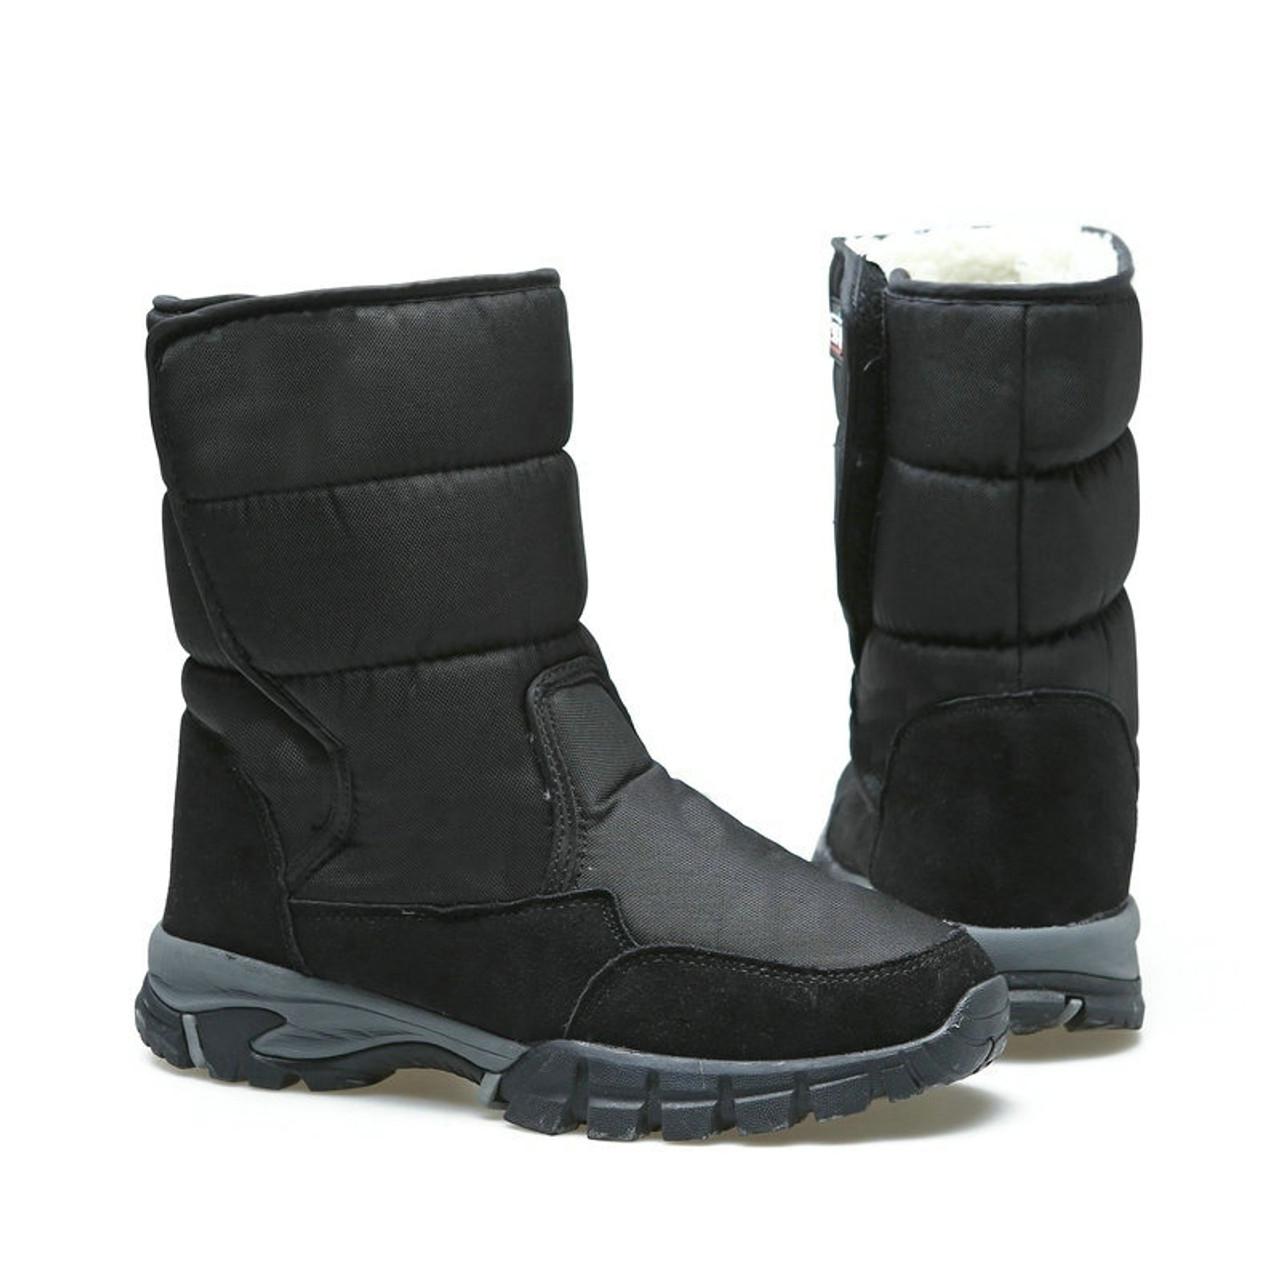 b963cc4cd7 2018 men boots black winter shoes male snowboots big size 48 warm fur Rubber  strong outsole ...